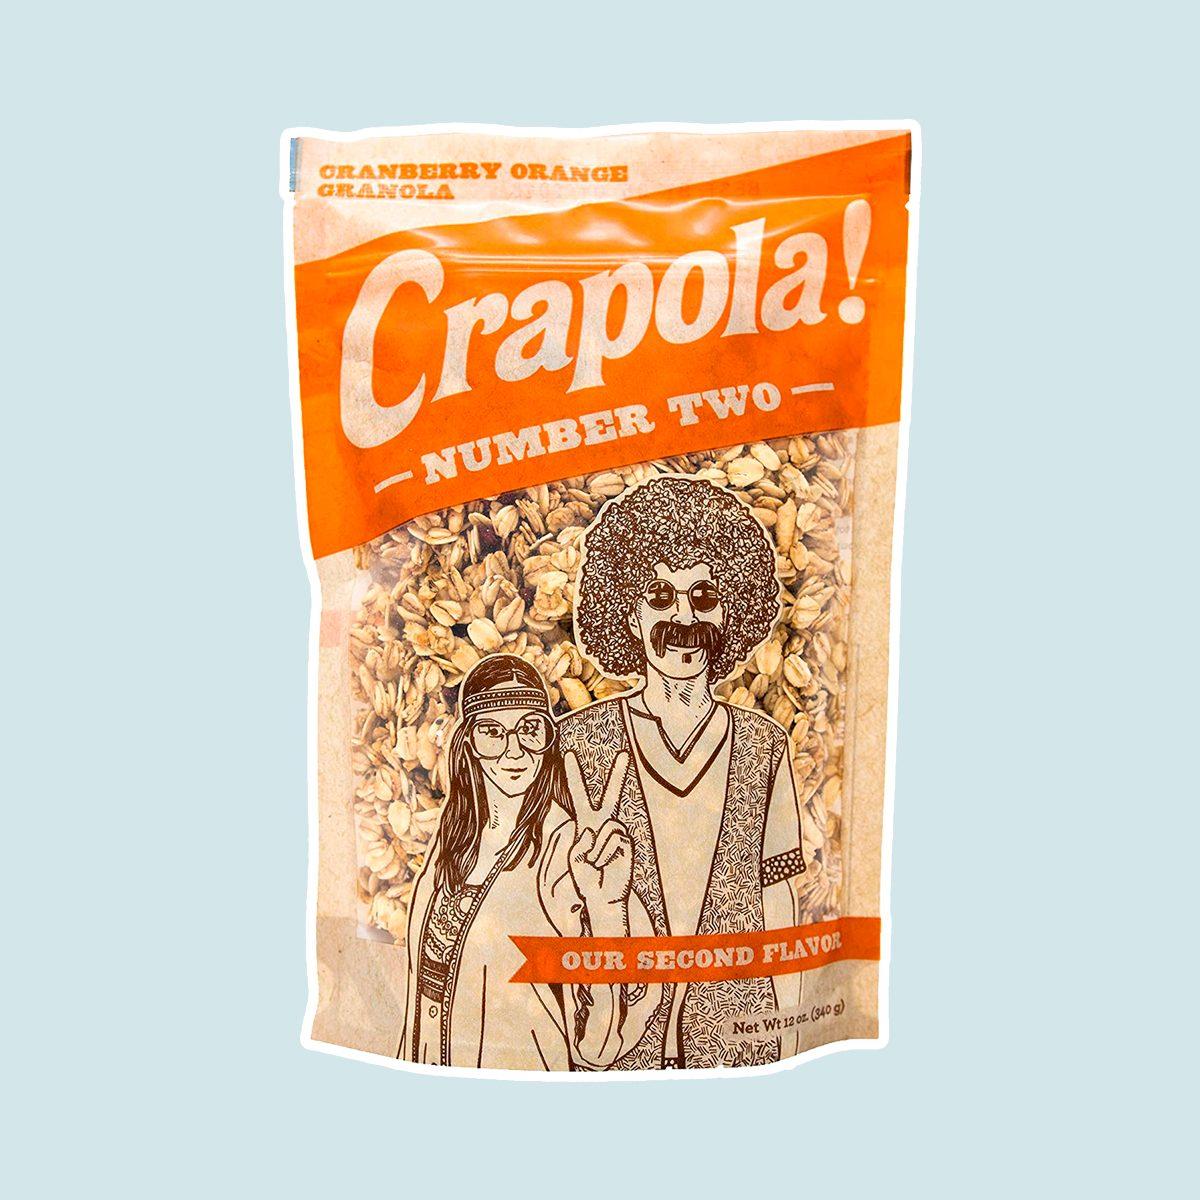 Crapola #2 Cranberry Orange Granola Cereal - All Natural, Healthy Breakfast or Snack - 12 oz Bag